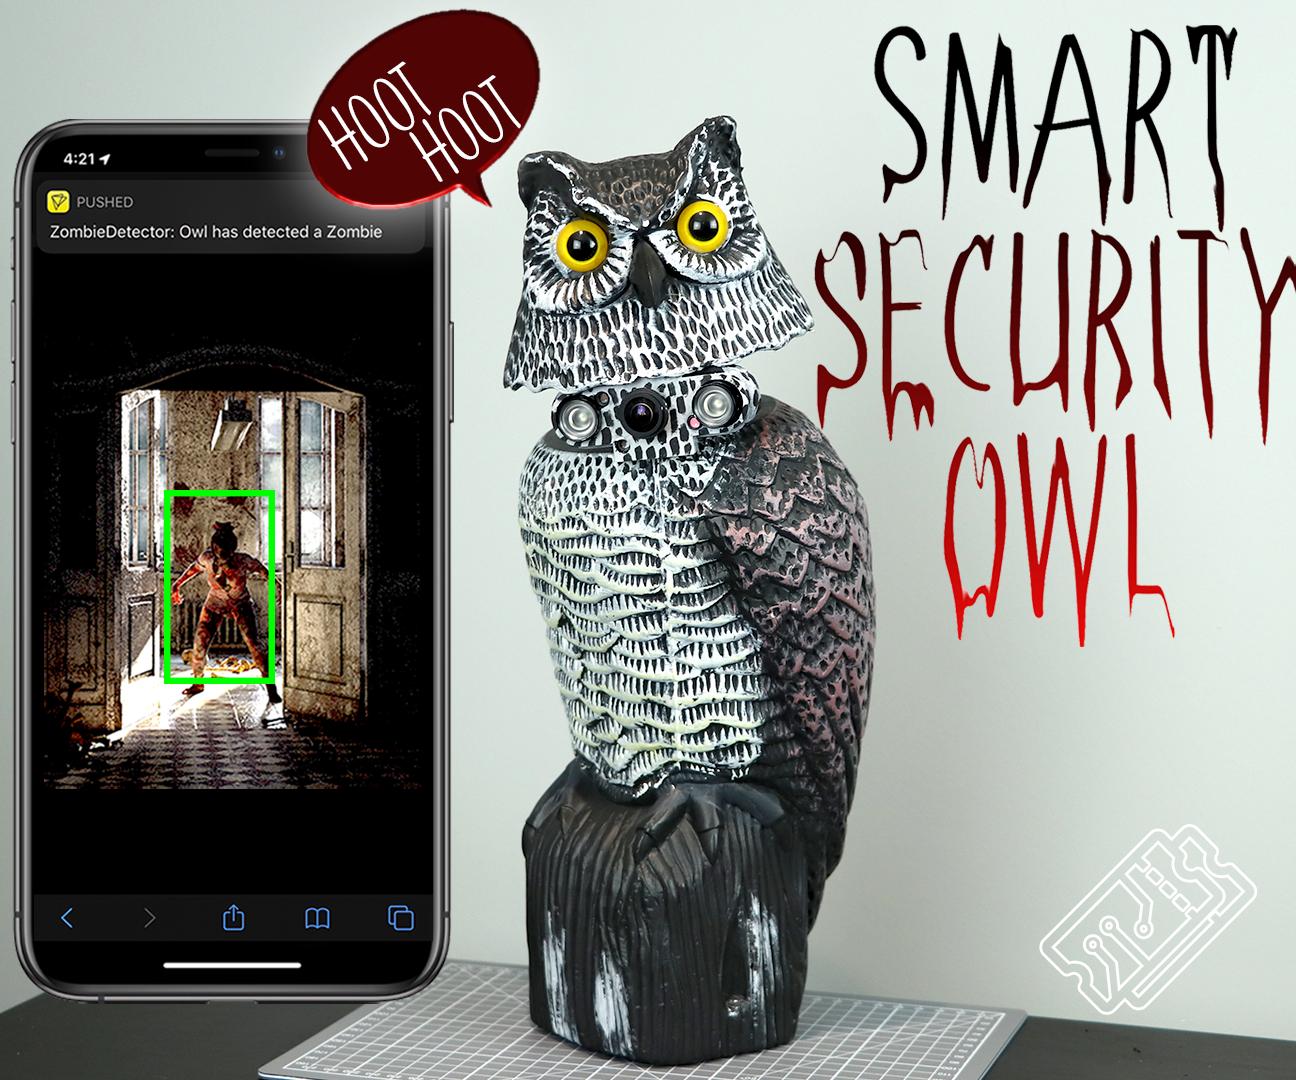 Smart Security Owl